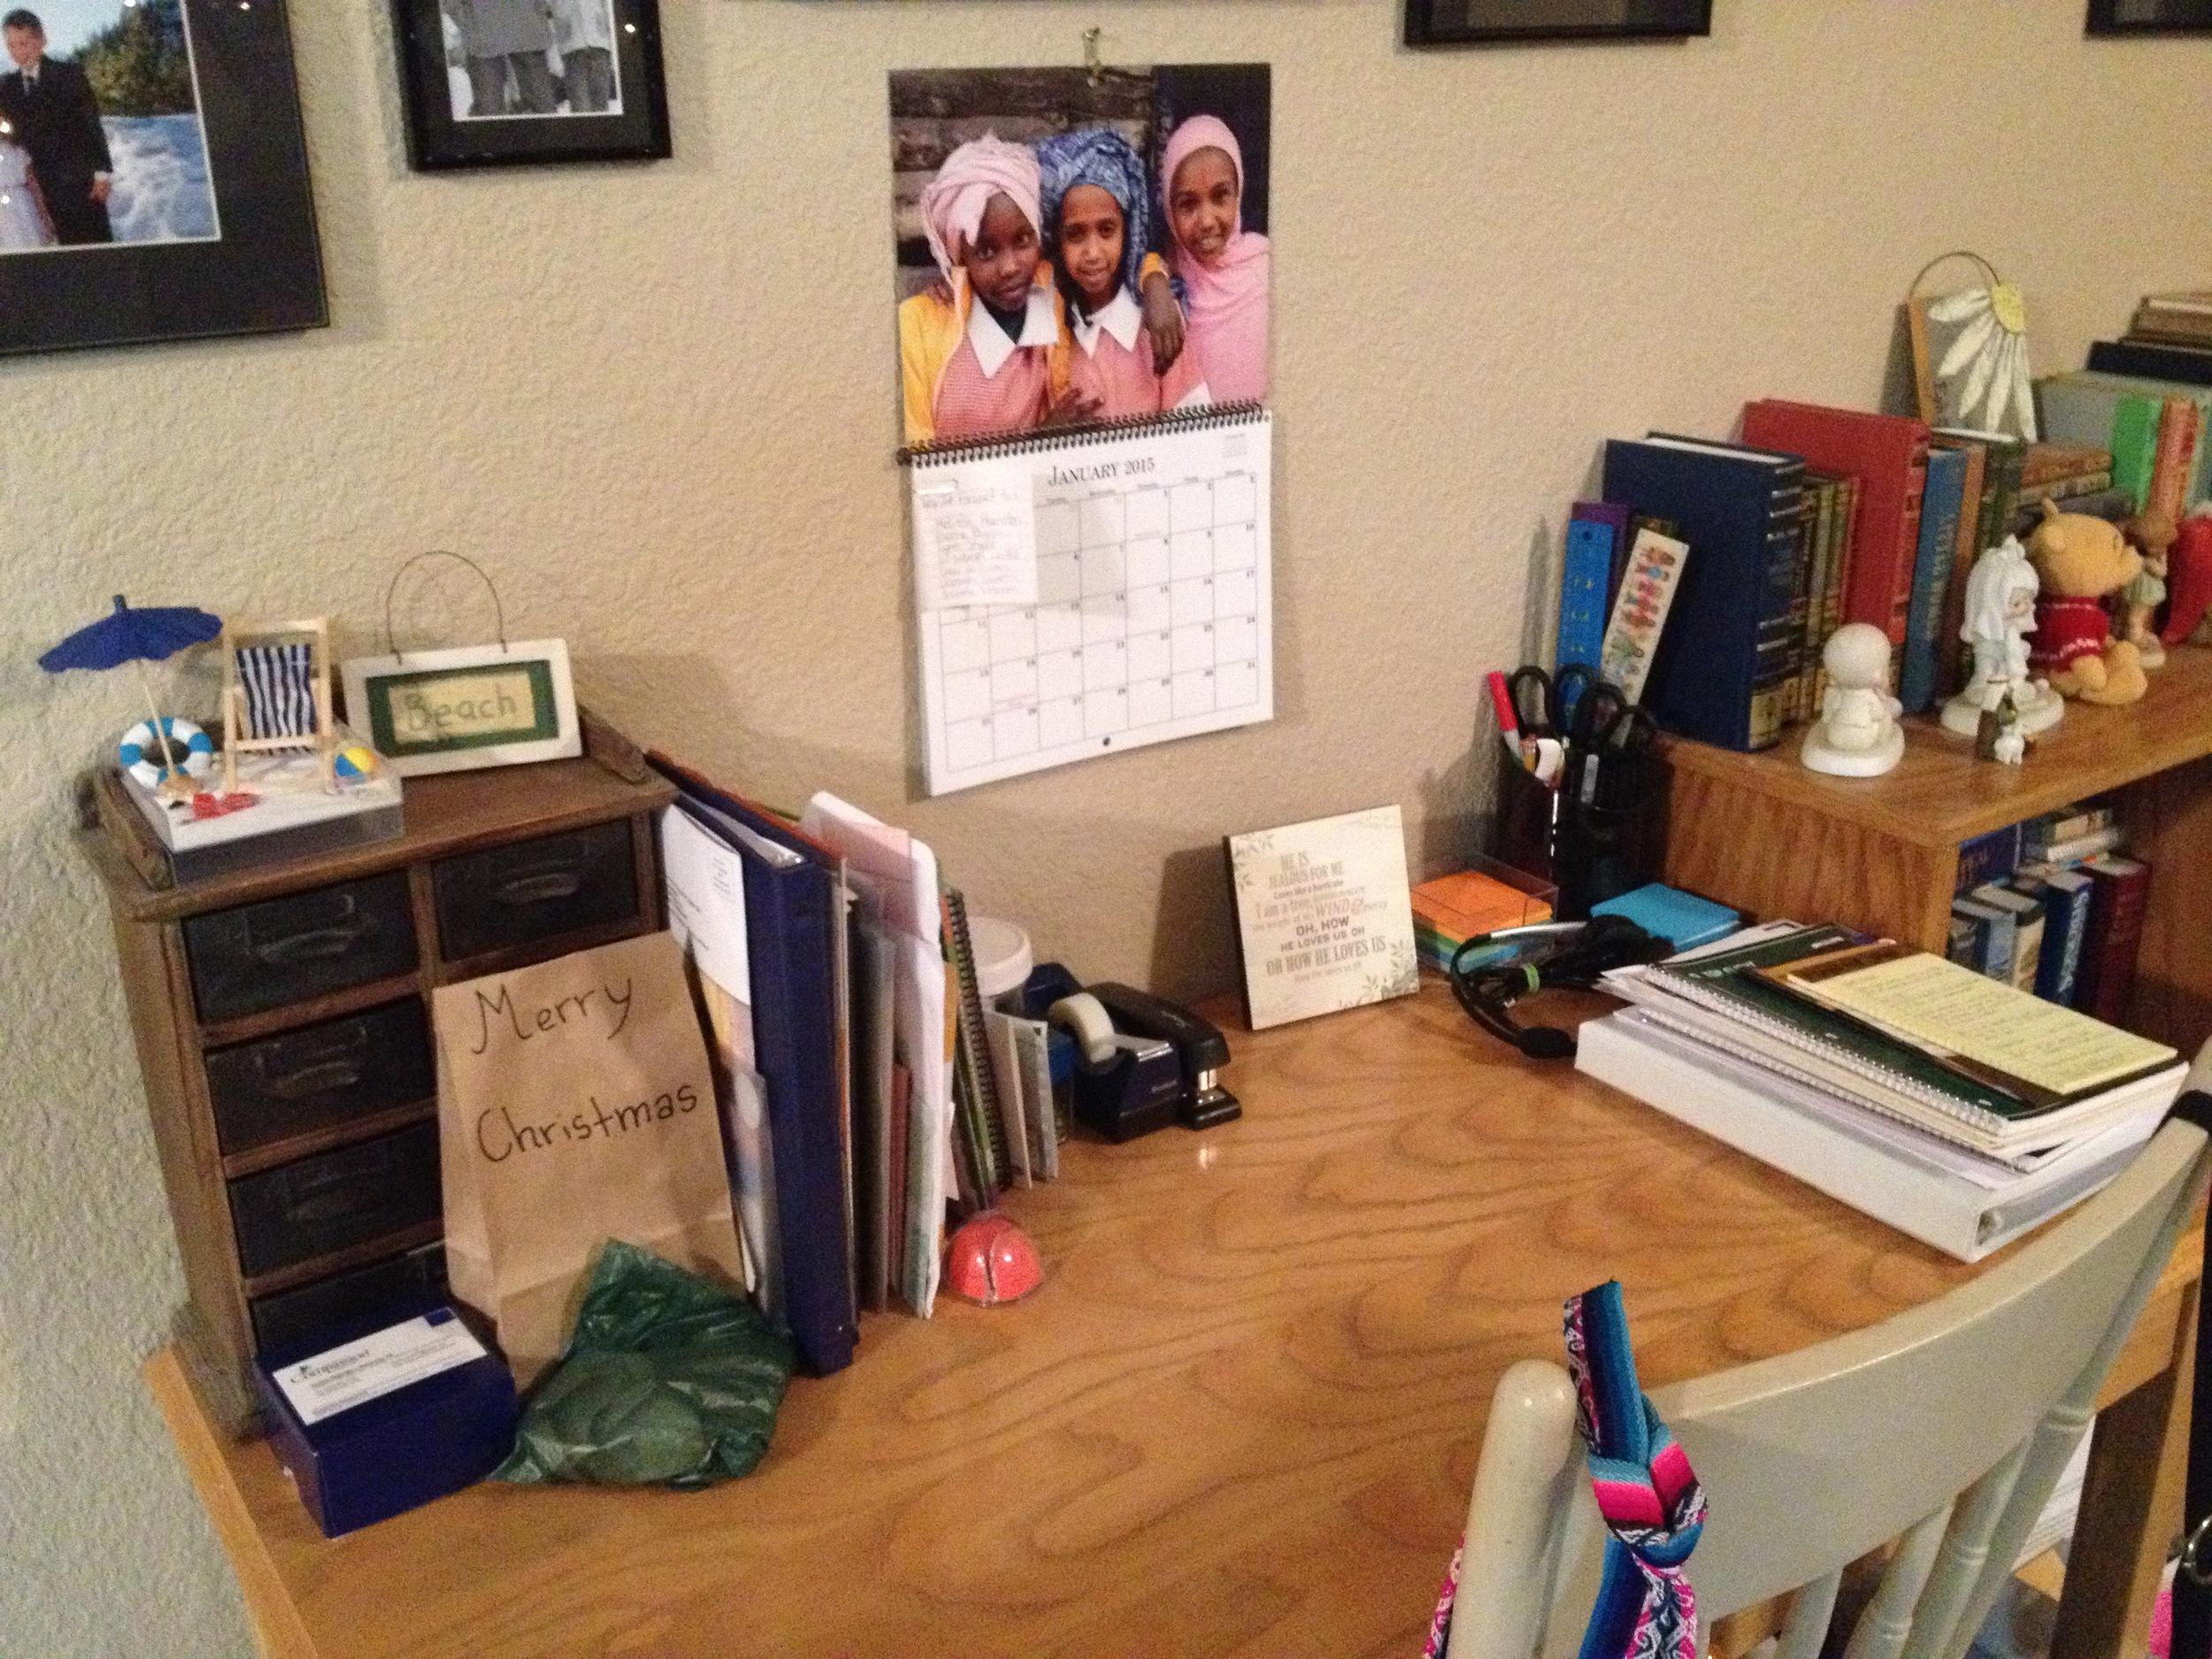 My de-cluttered desk